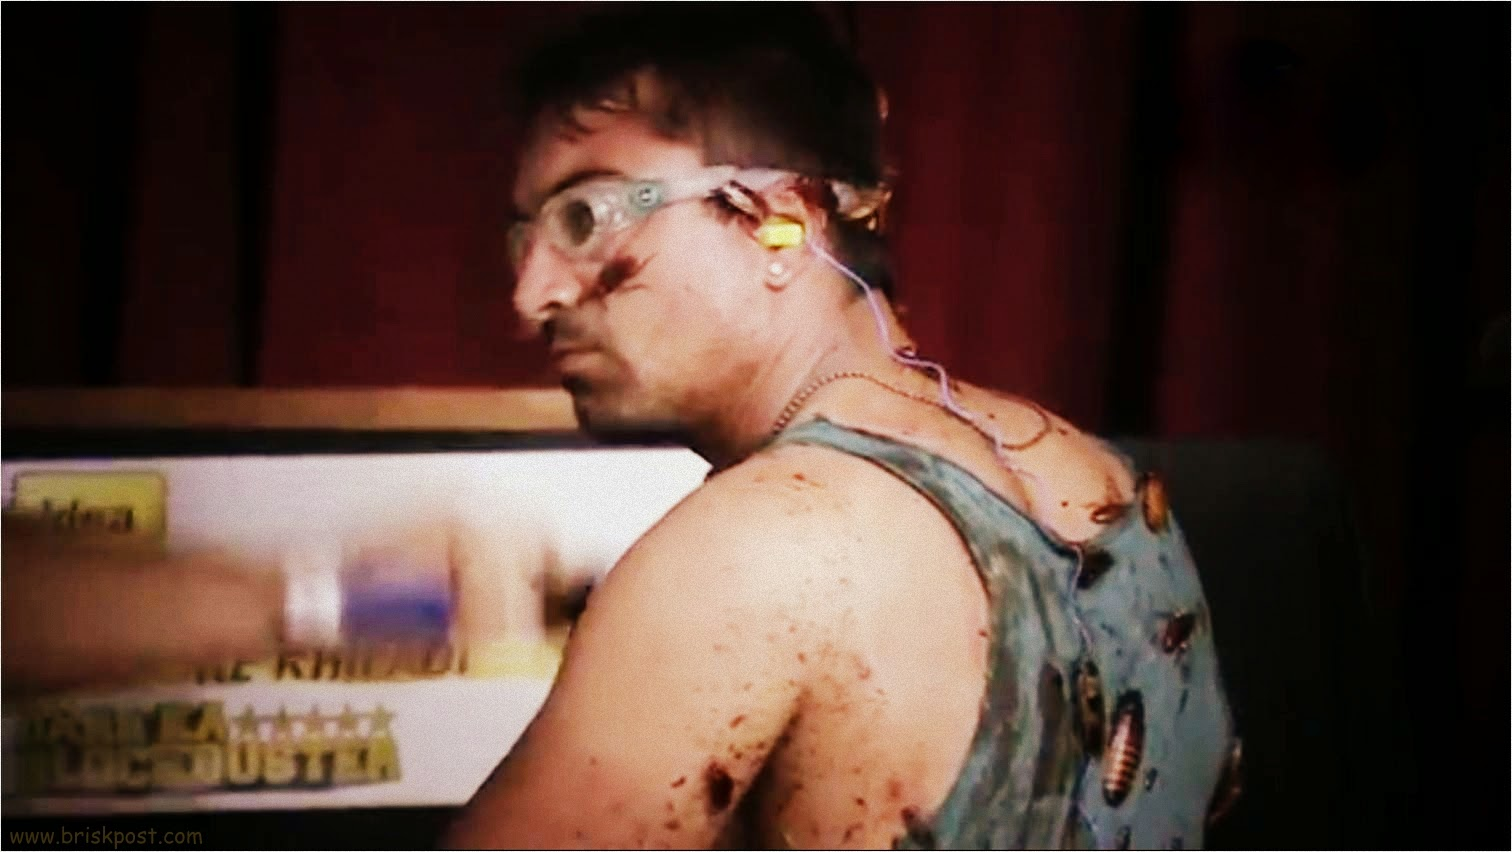 Cockroaches, crickets, earthworms and insects on Ajaz Khan after Darr Ka Blockbuster Khatron Ke Khiladi stunt